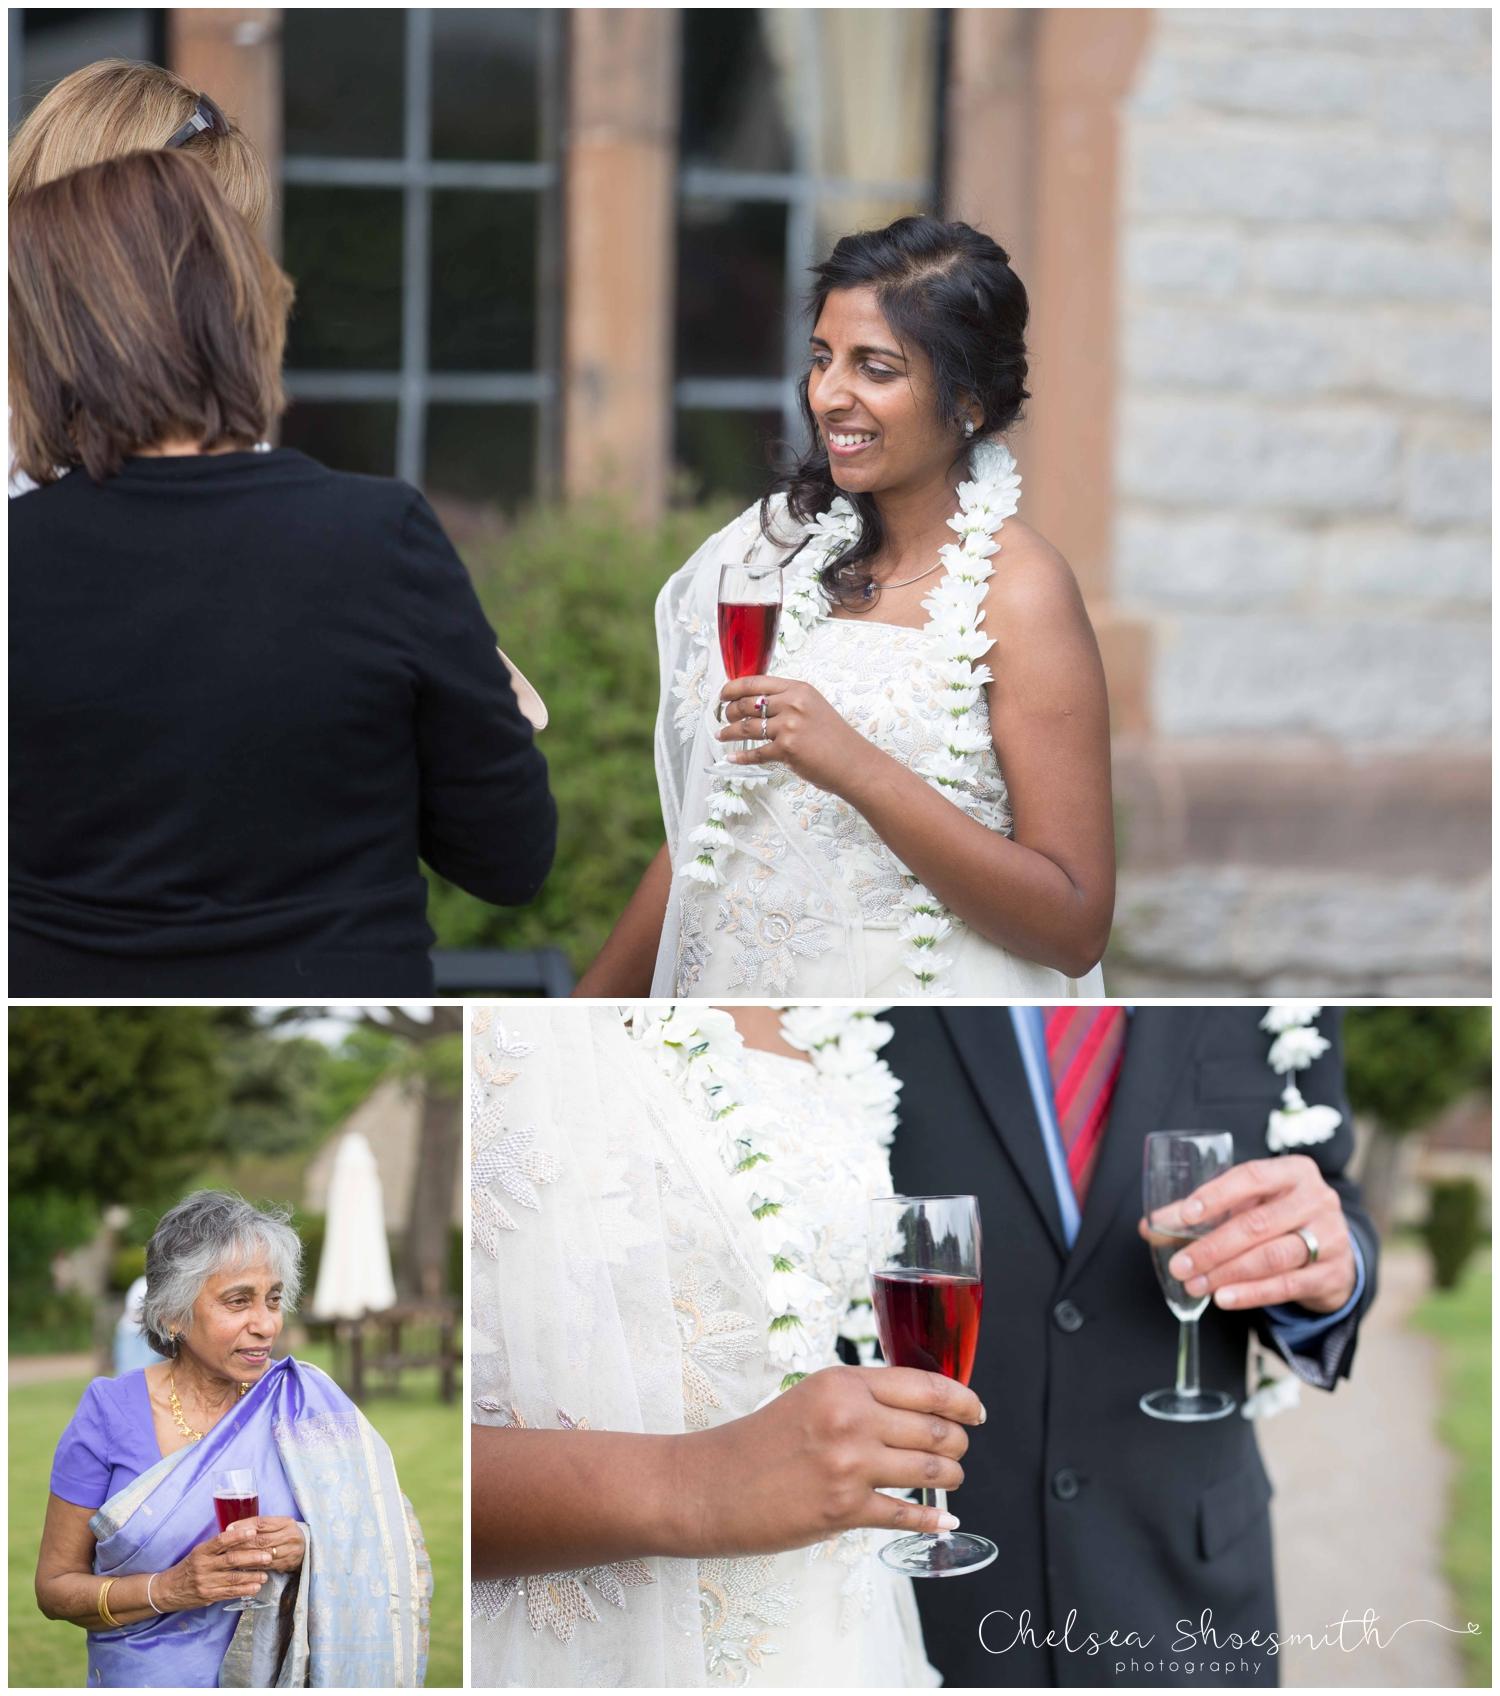 (218 of 516) Anil & Aloka Wedding Photography Stratford Warwickshire Billesley Manor Chelsea Shoesmith Photography_